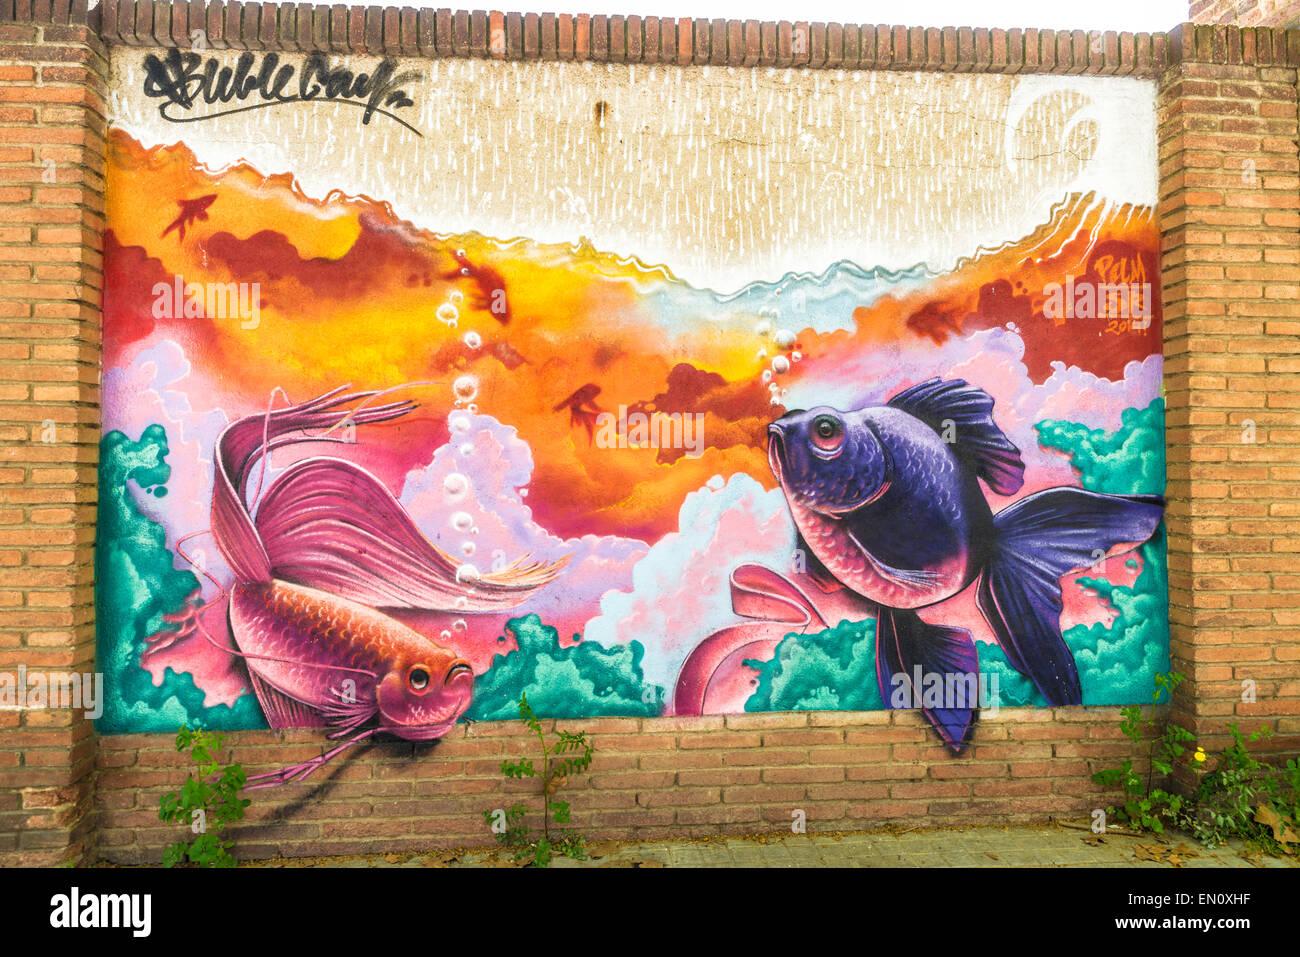 Graffiti wall barcelona - Stock Photo Wall Covered With Graffiti In Barcelona Catalonia Spain